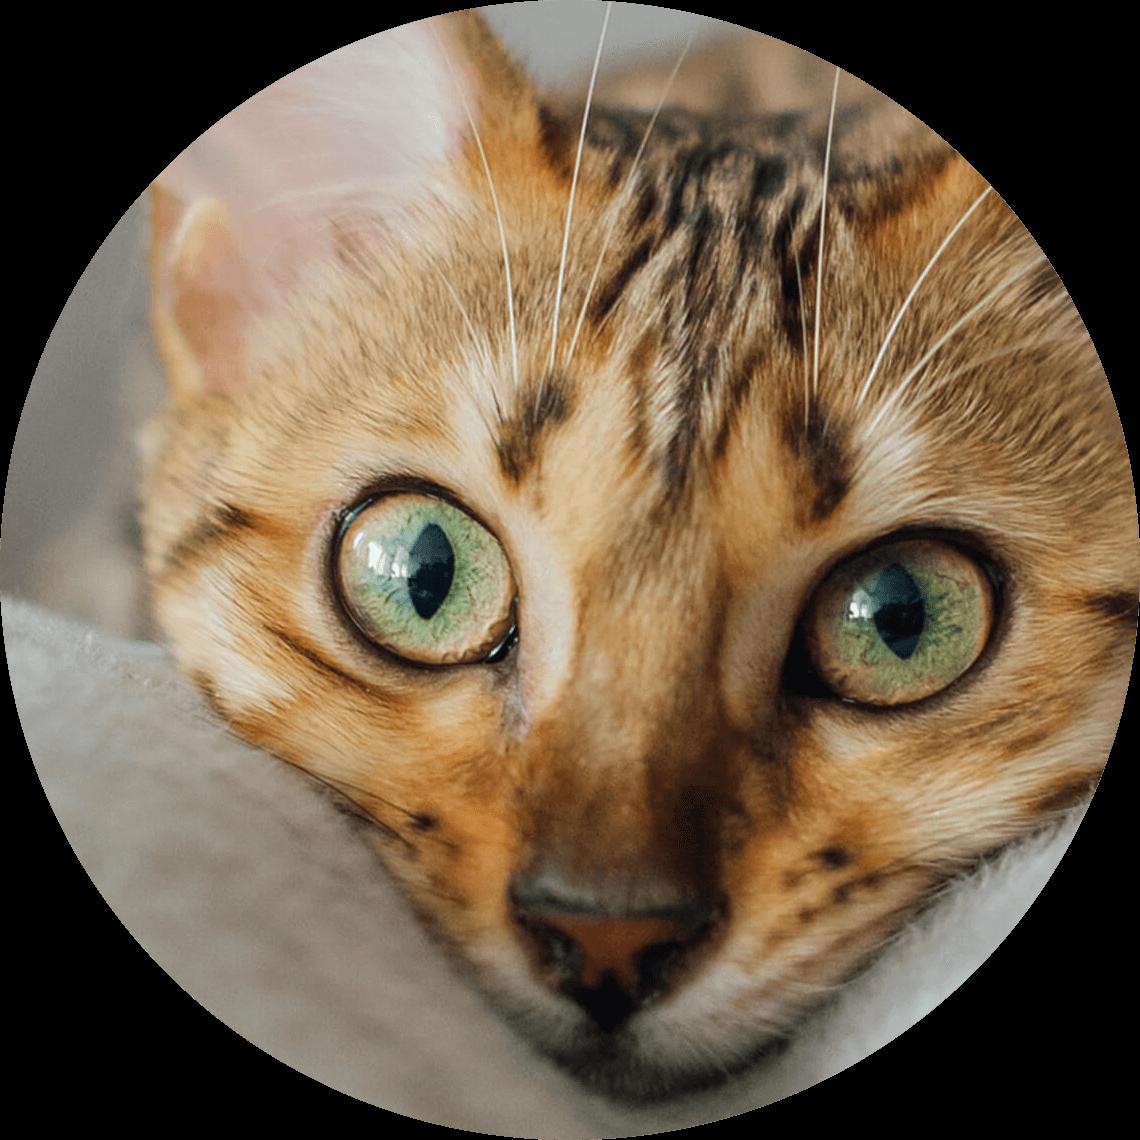 Kuschelnde Katze